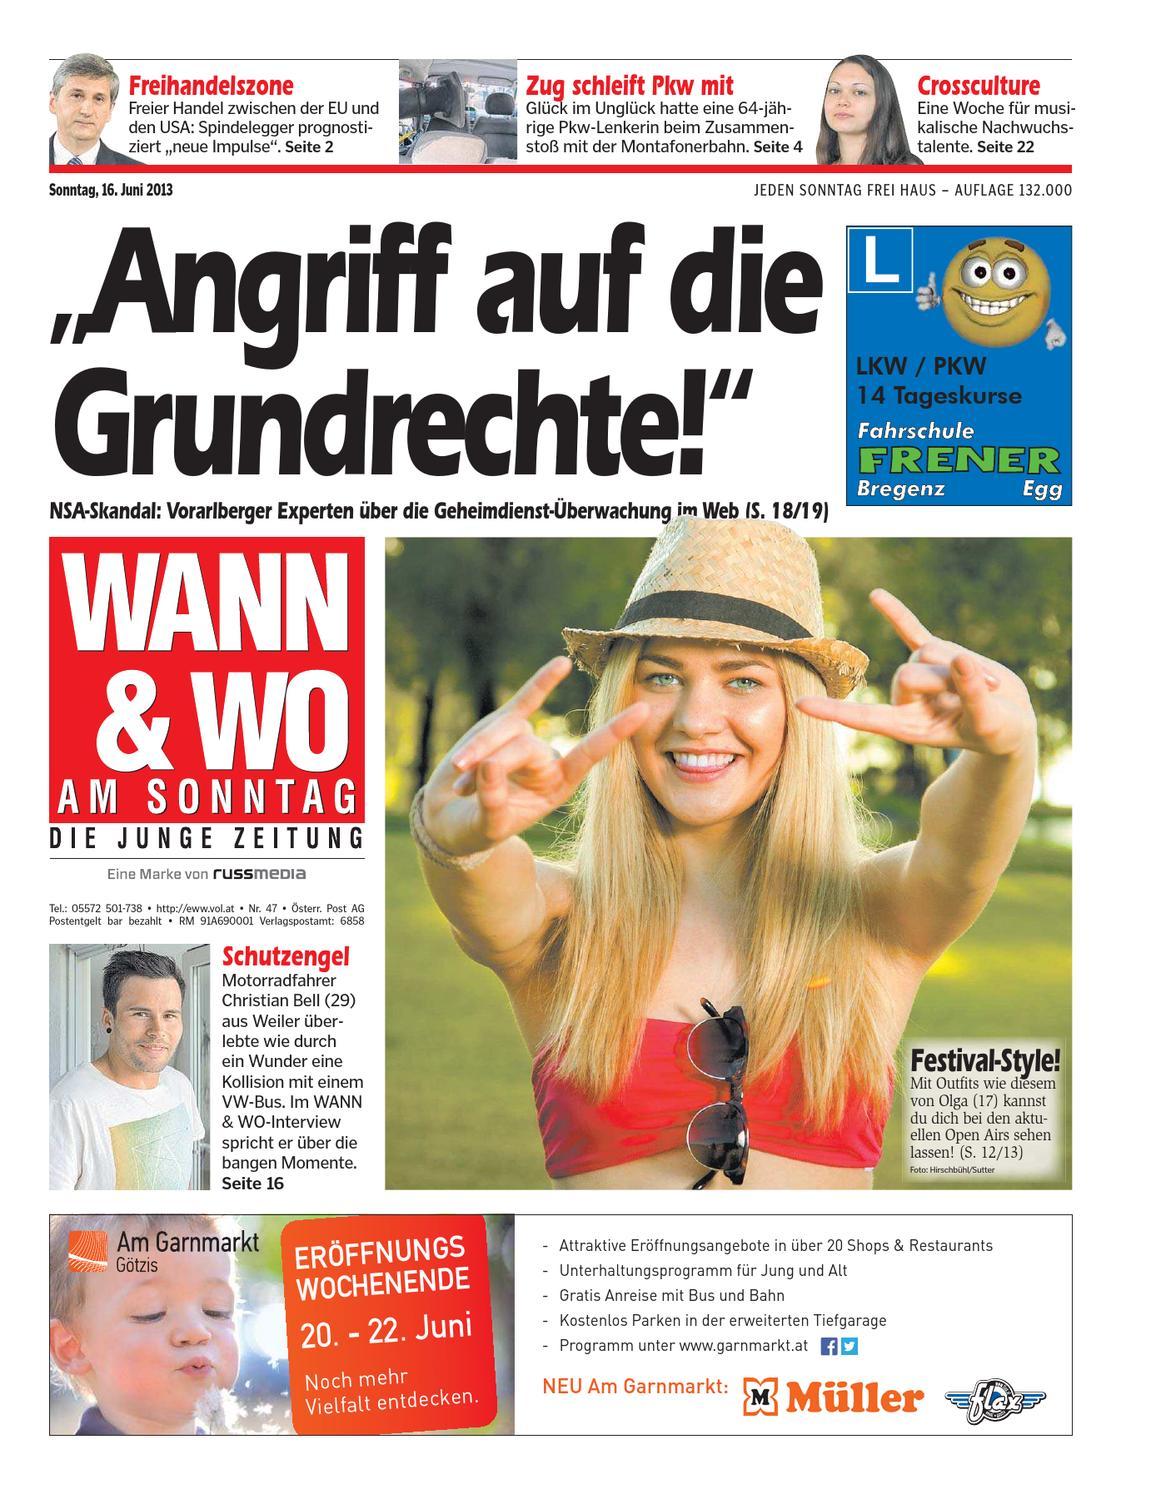 Christliche Partnersuche huggology.com - gratis